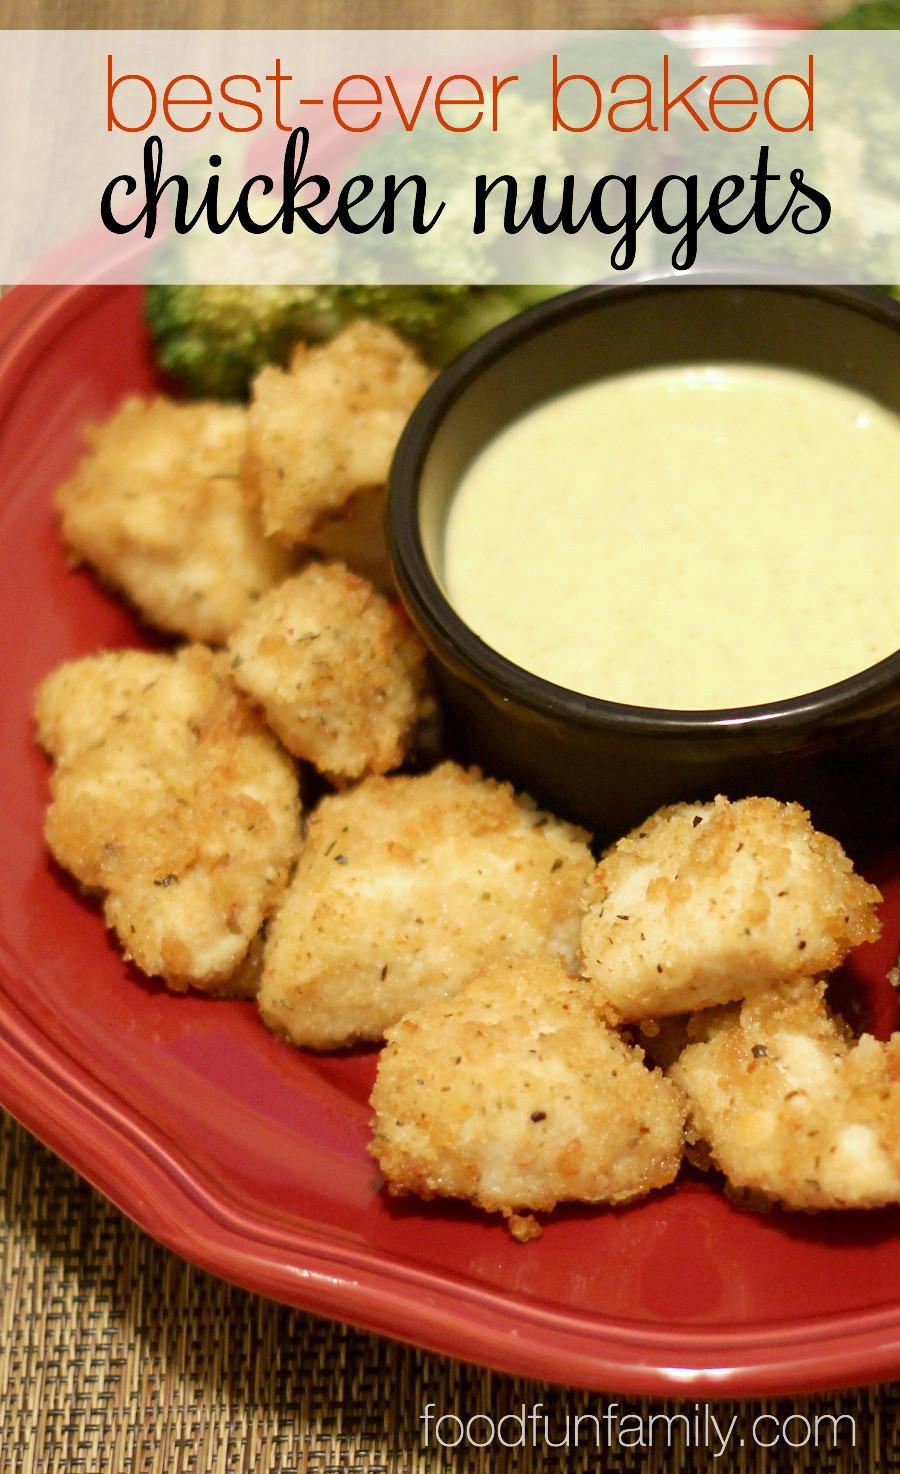 Baked Chicken Nuggets Recipe  Best Ever Baked Chicken Nug s